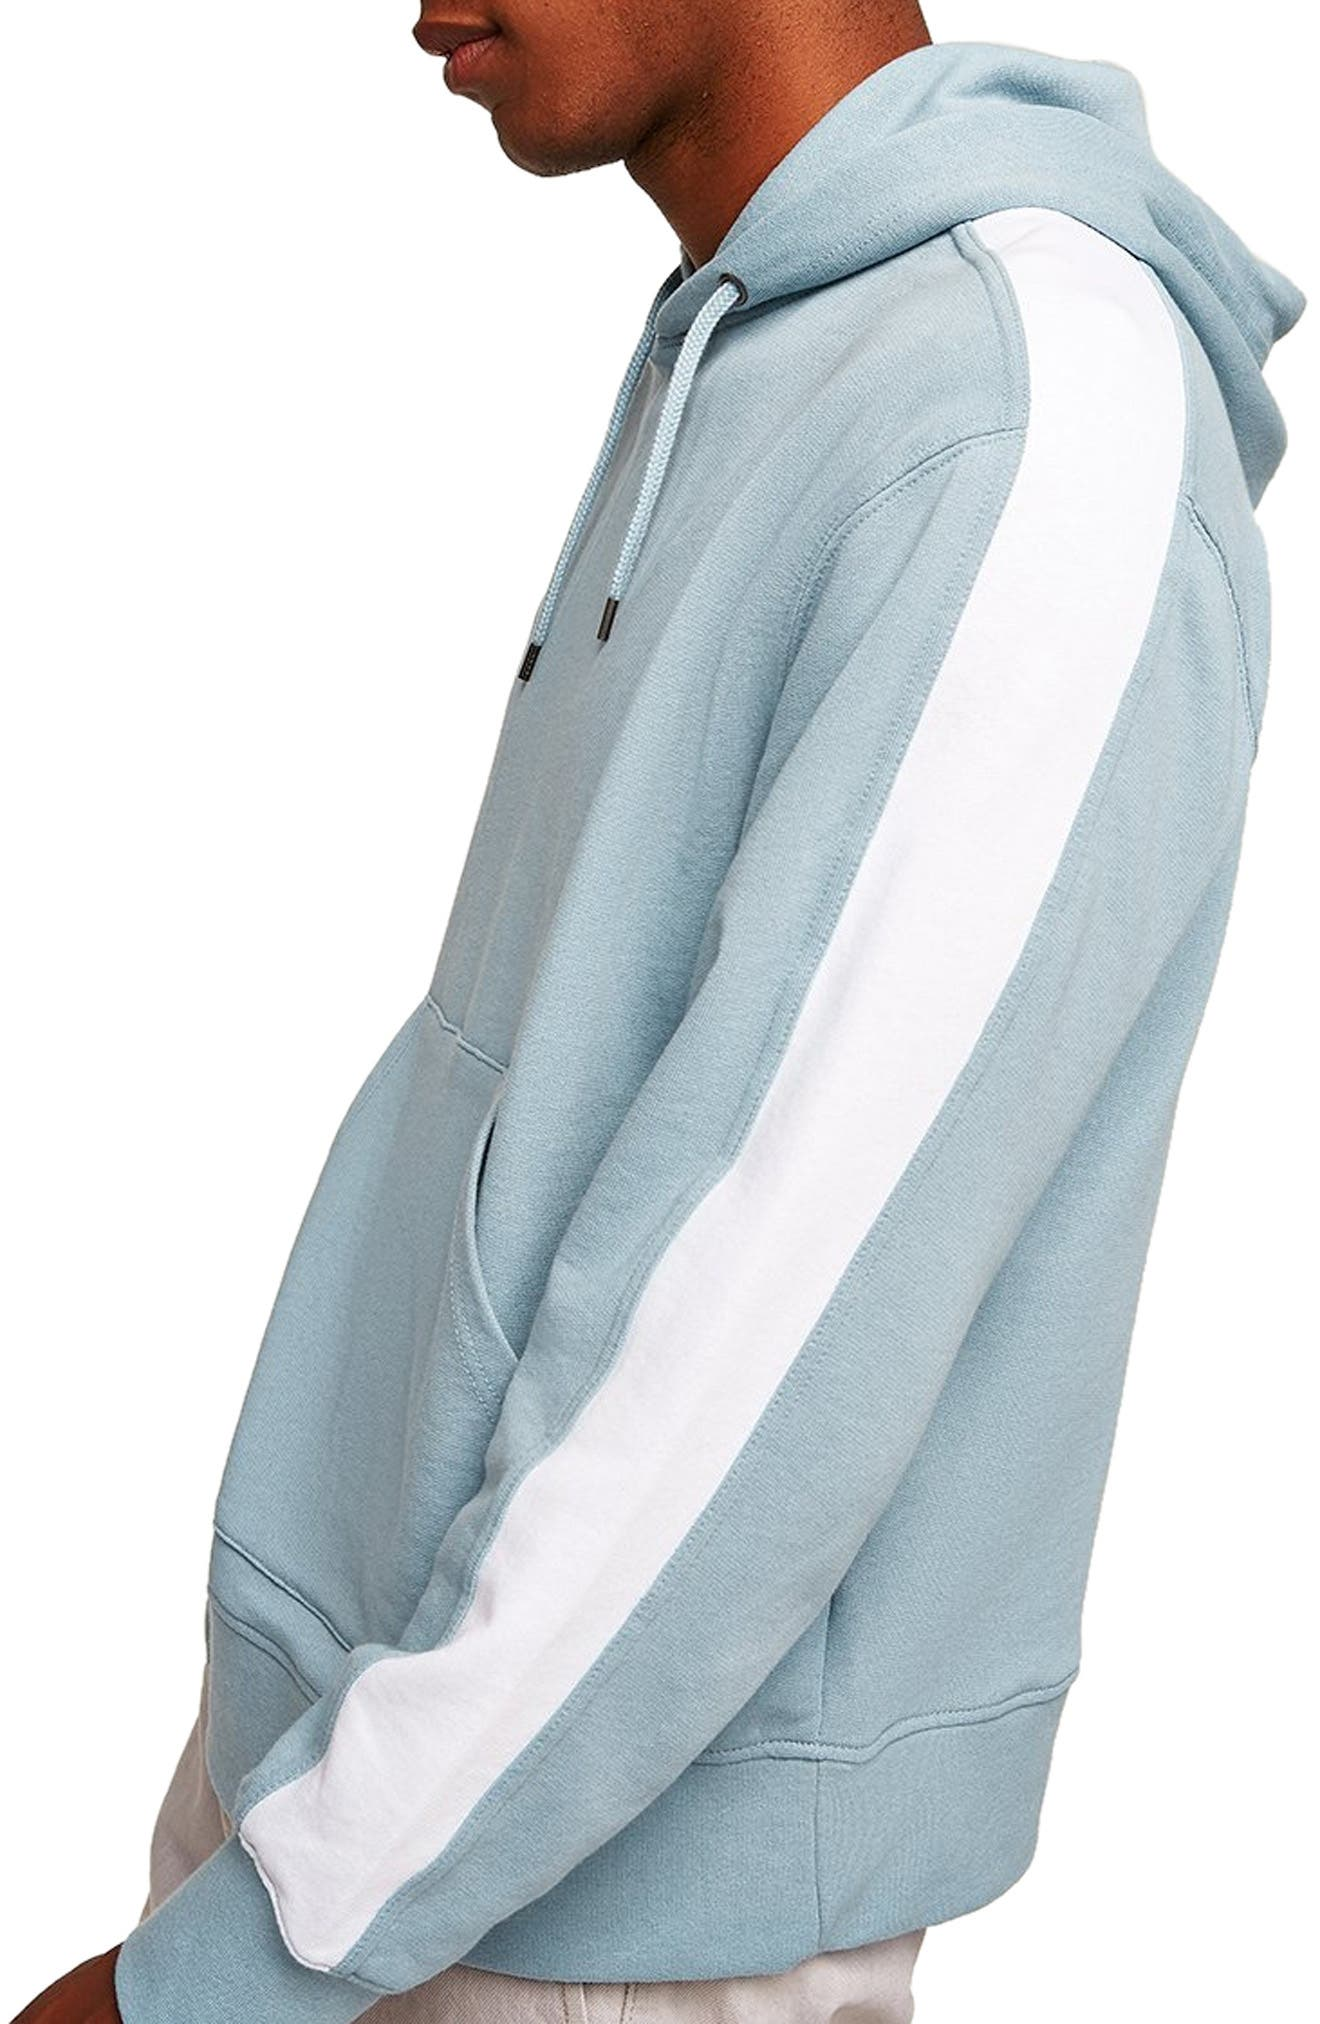 Colorblock Hooded Sweatshirt,                             Alternate thumbnail 3, color,                             400